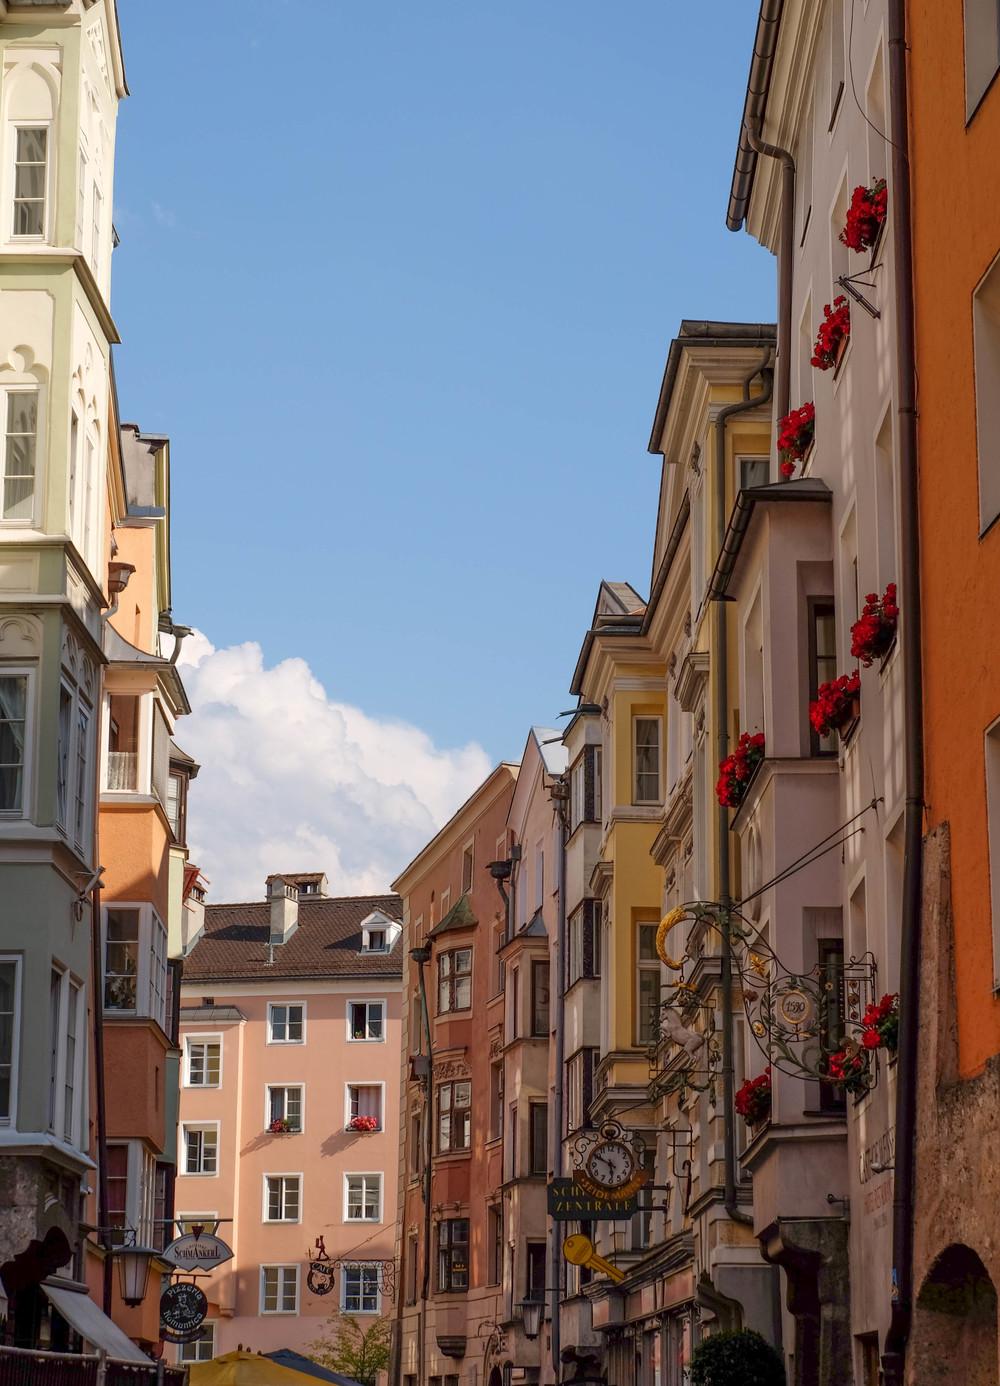 LaurenSchwaiger-Travel-Blog-Austria-Tyrol-Innsbruck.jpg